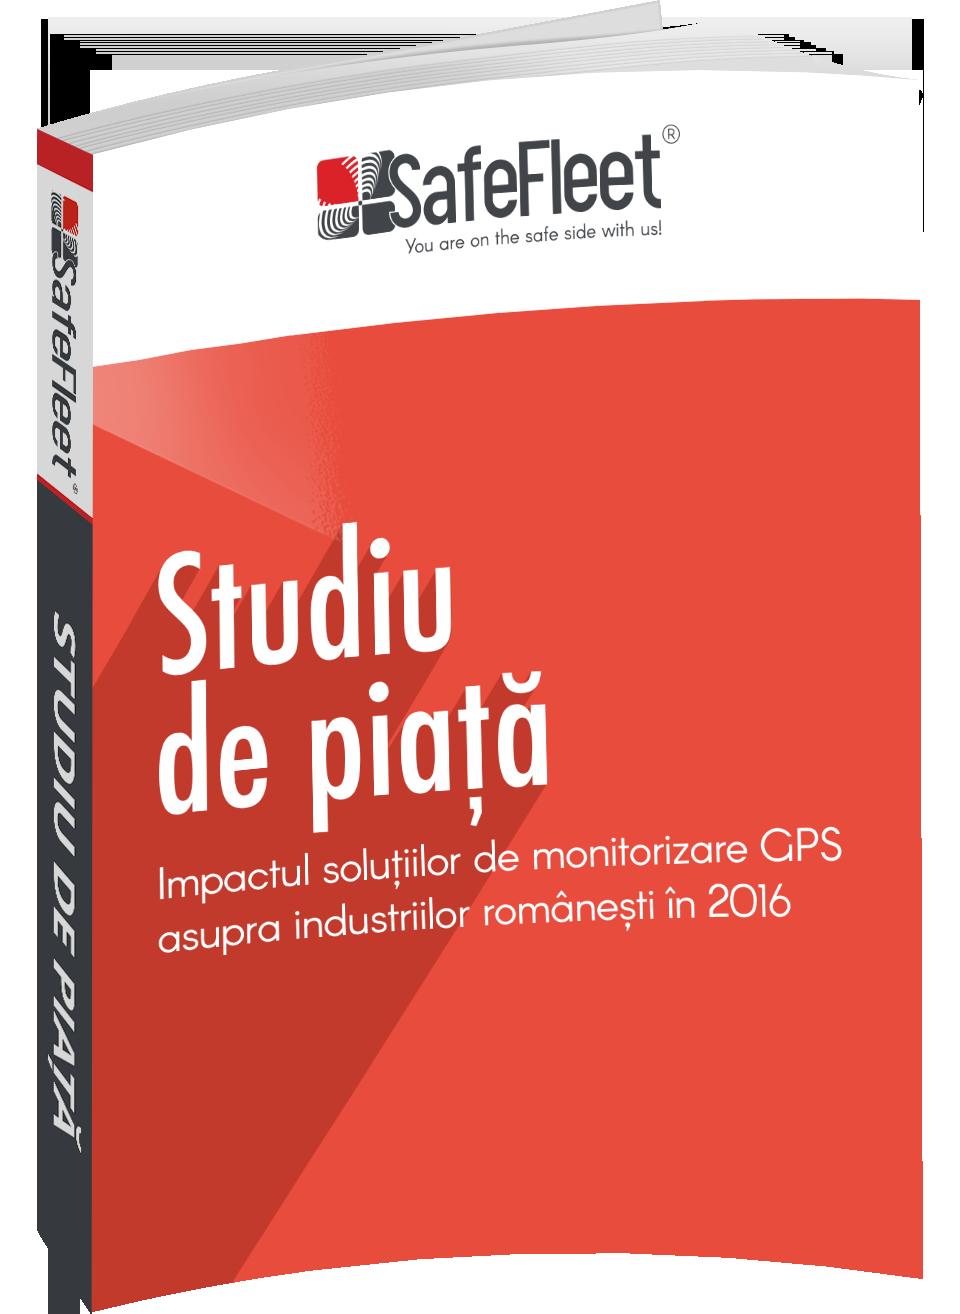 studiu-ebook-cover-REDESIGN.png